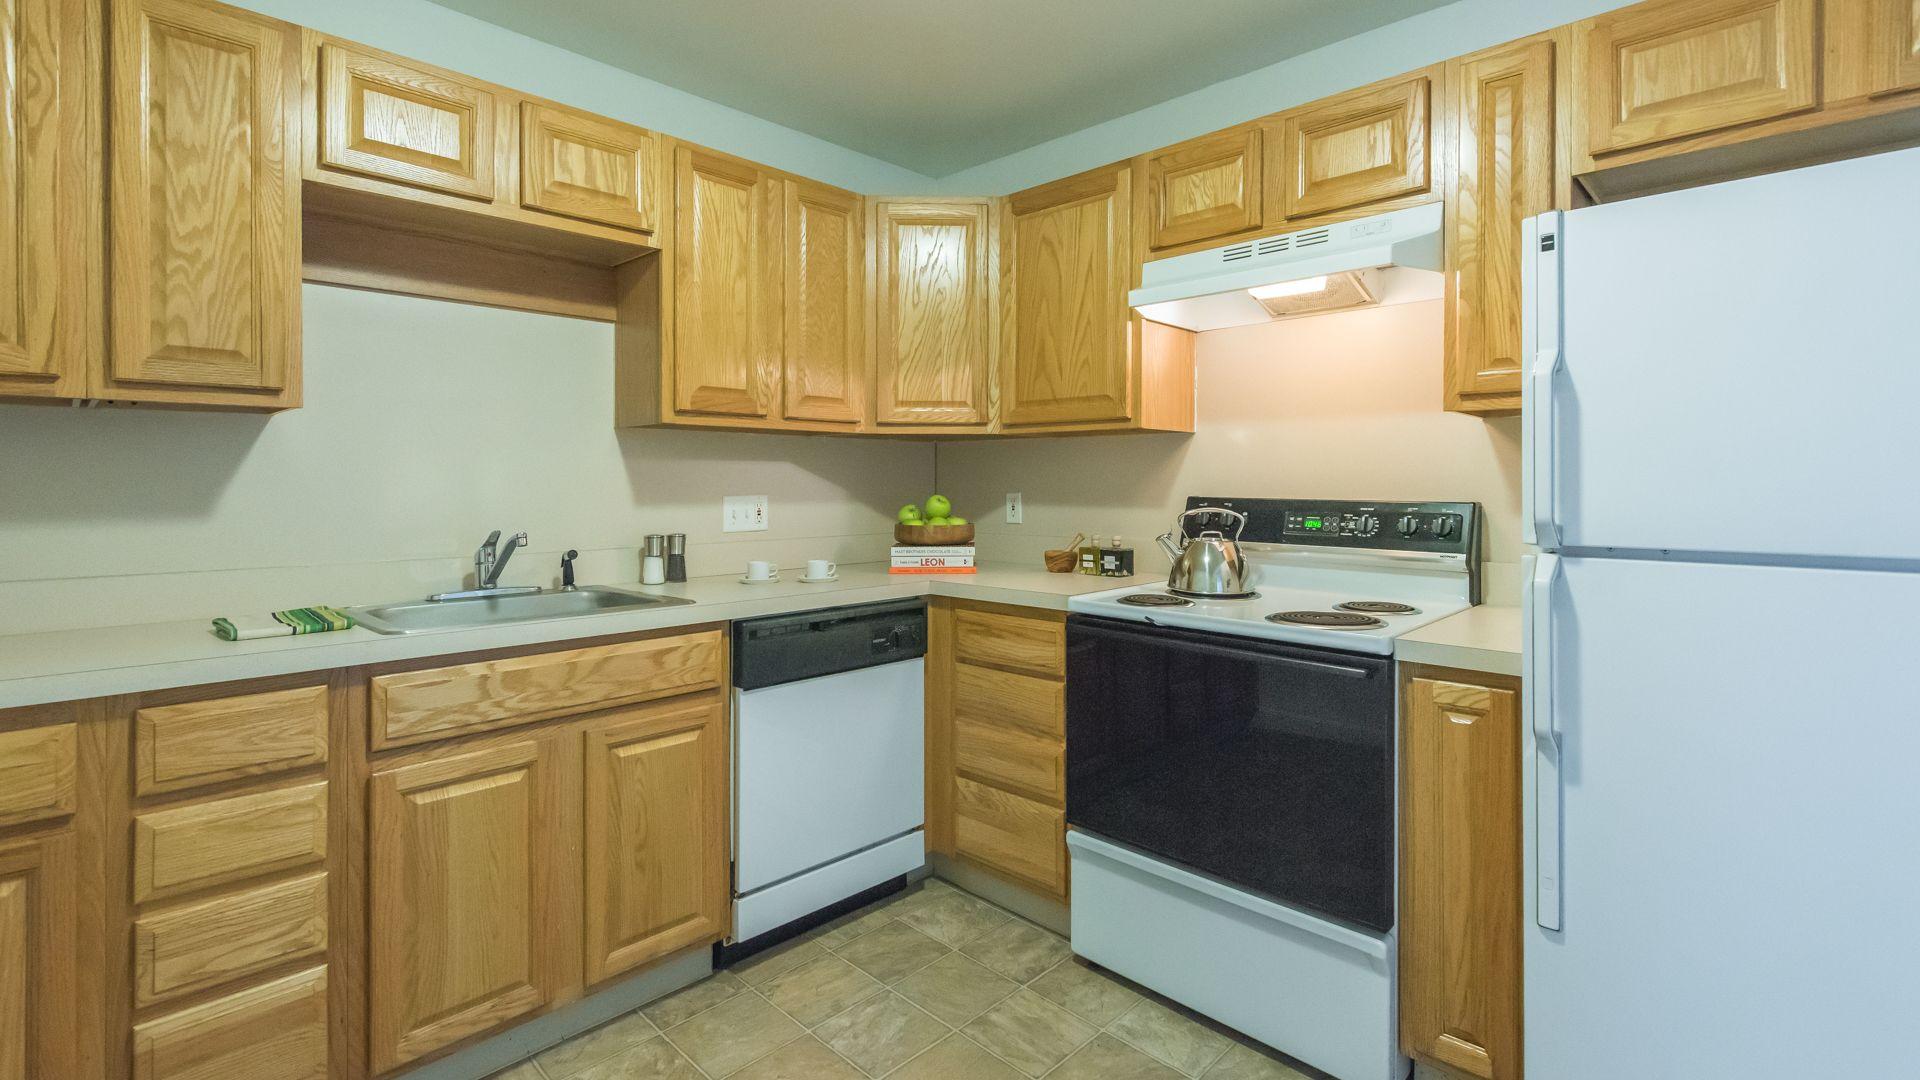 Glen Meadow Apartments - Kitchen